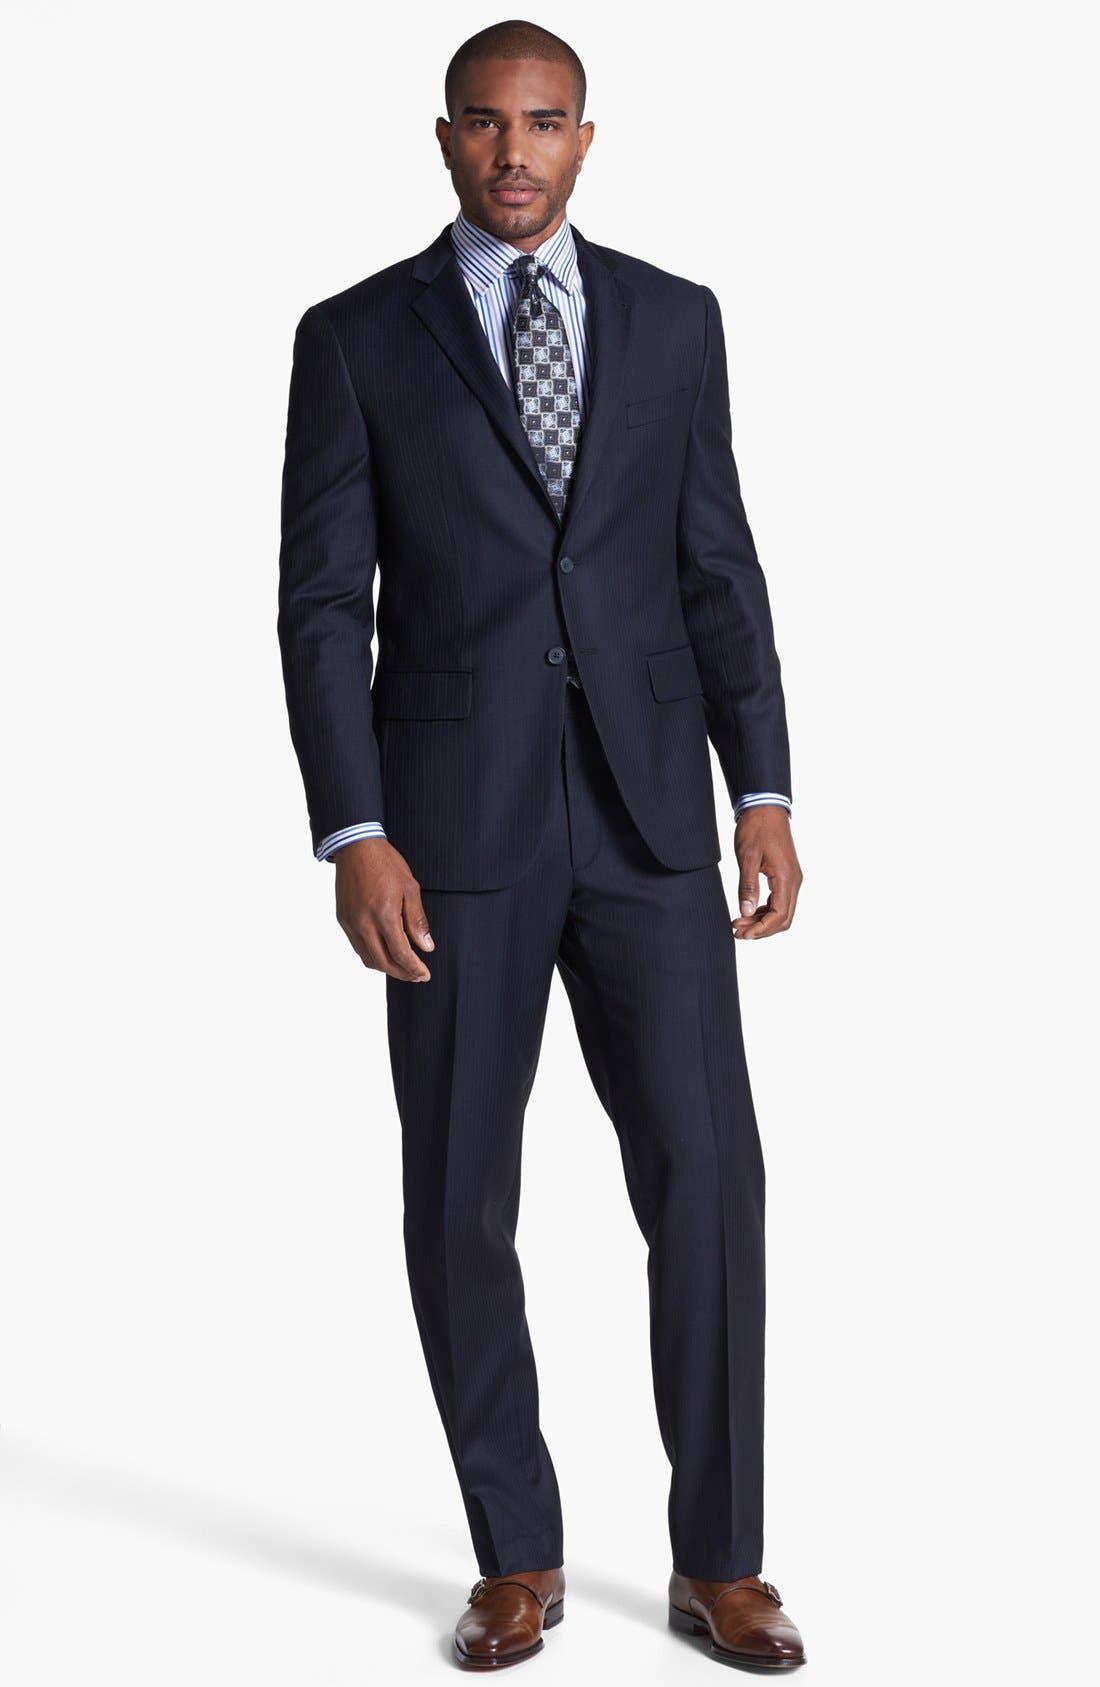 Alternate Image 1 Selected - Joseph Abboud Suit & David Donahue Dress Shirt